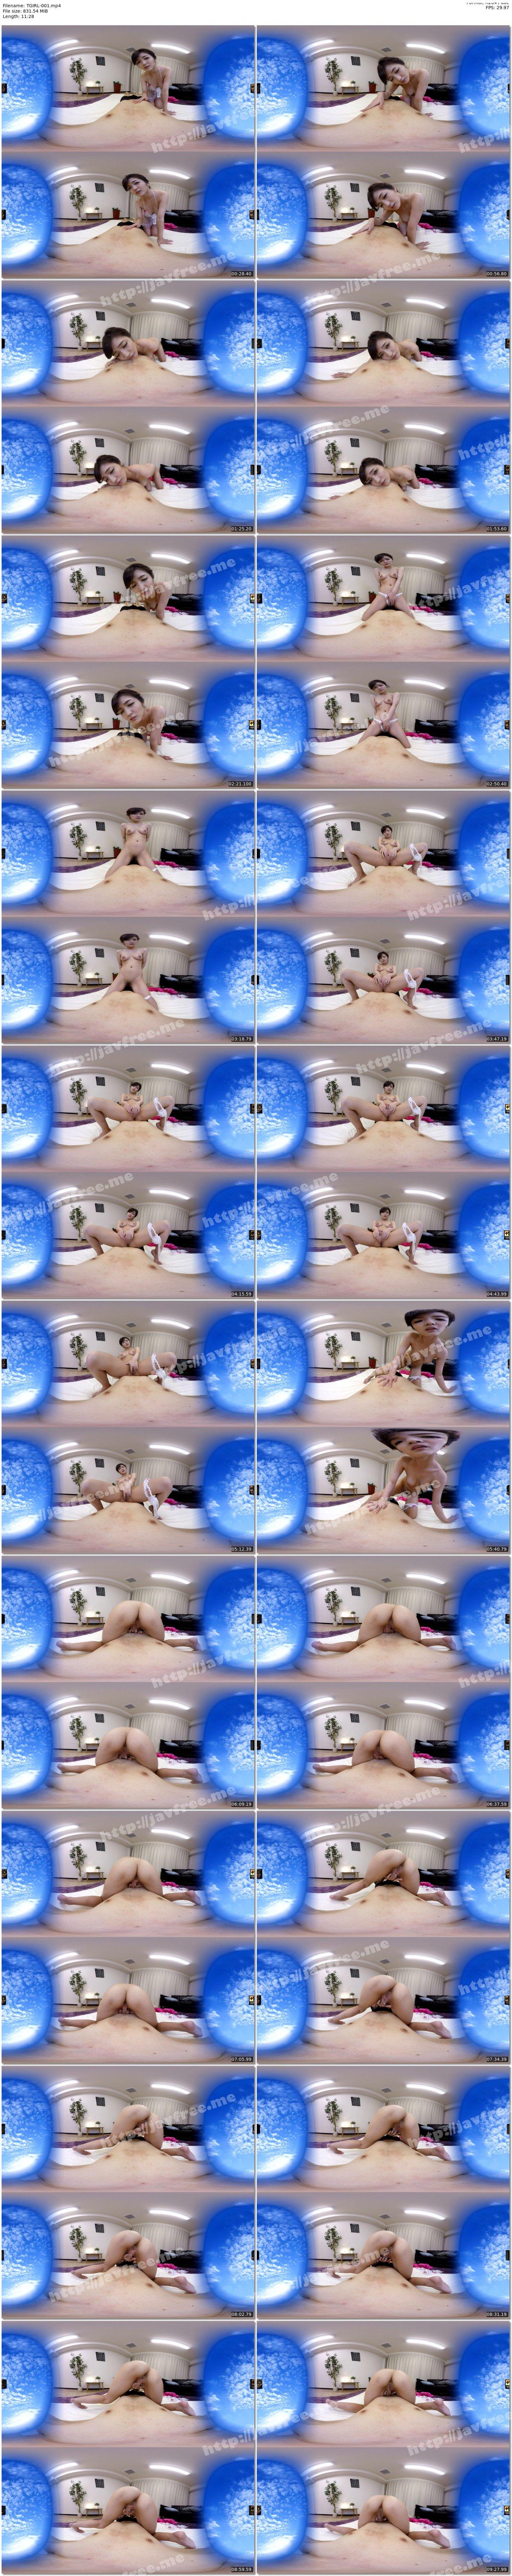 [TGIRL-001] 【VR】見せつけ誘惑密着オナニー 青山はな - image TGIRL-001 on https://javfree.me